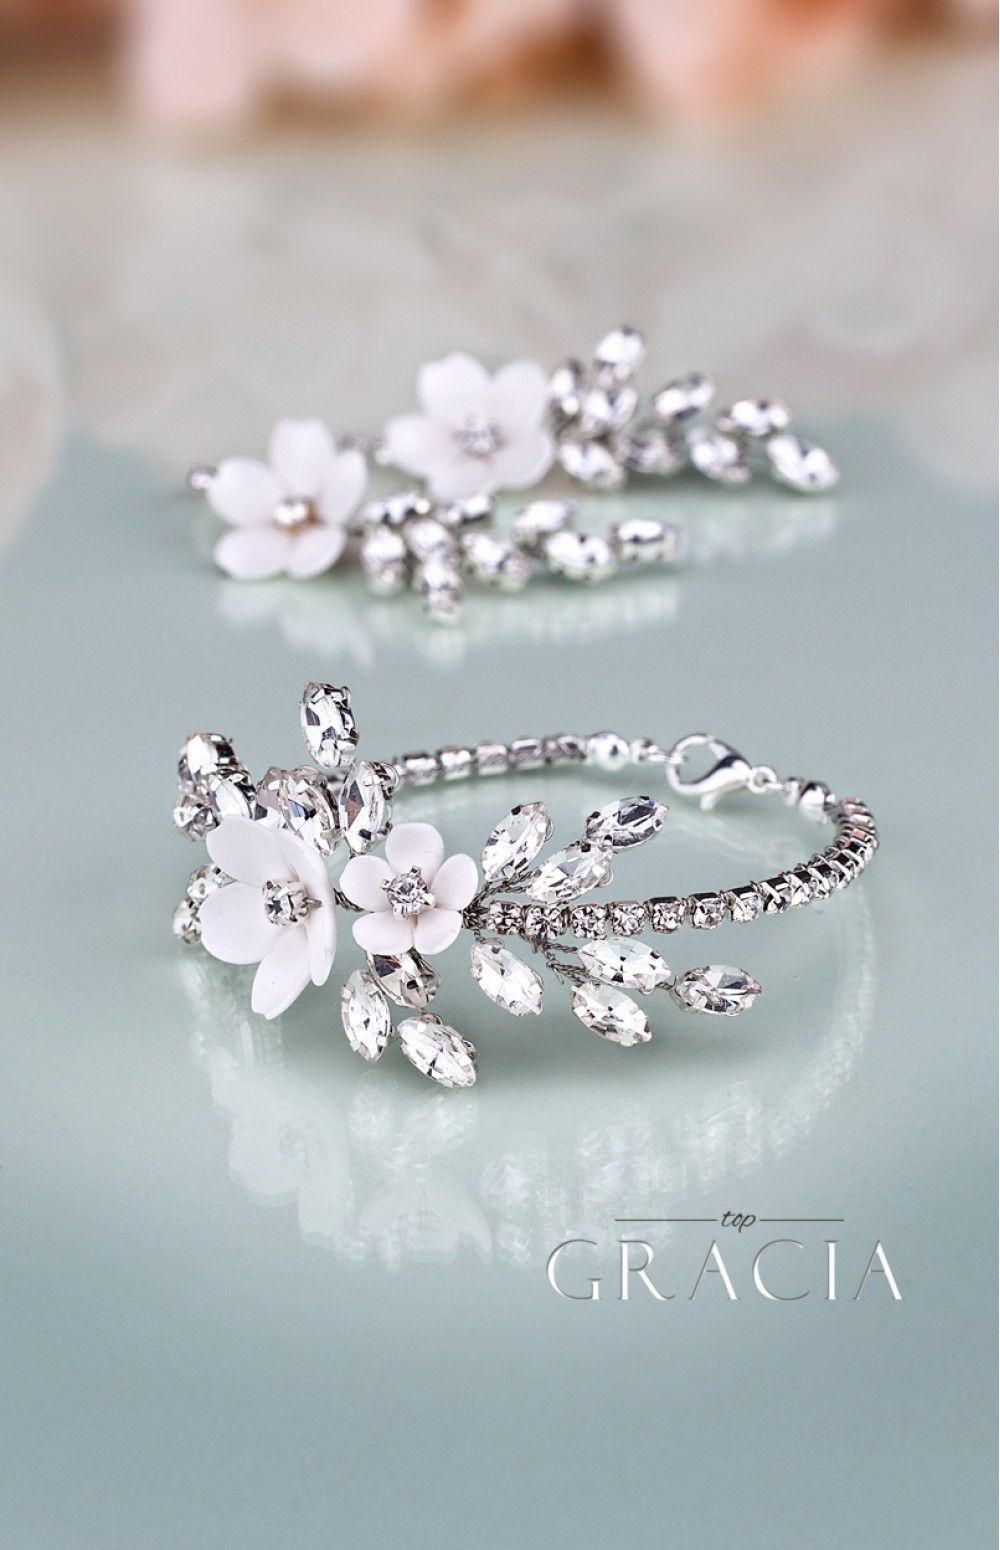 KORINNA Wedding Crystal White Flower Jewelery Set Bridal Earrings And Bracelet by TopGracia 17